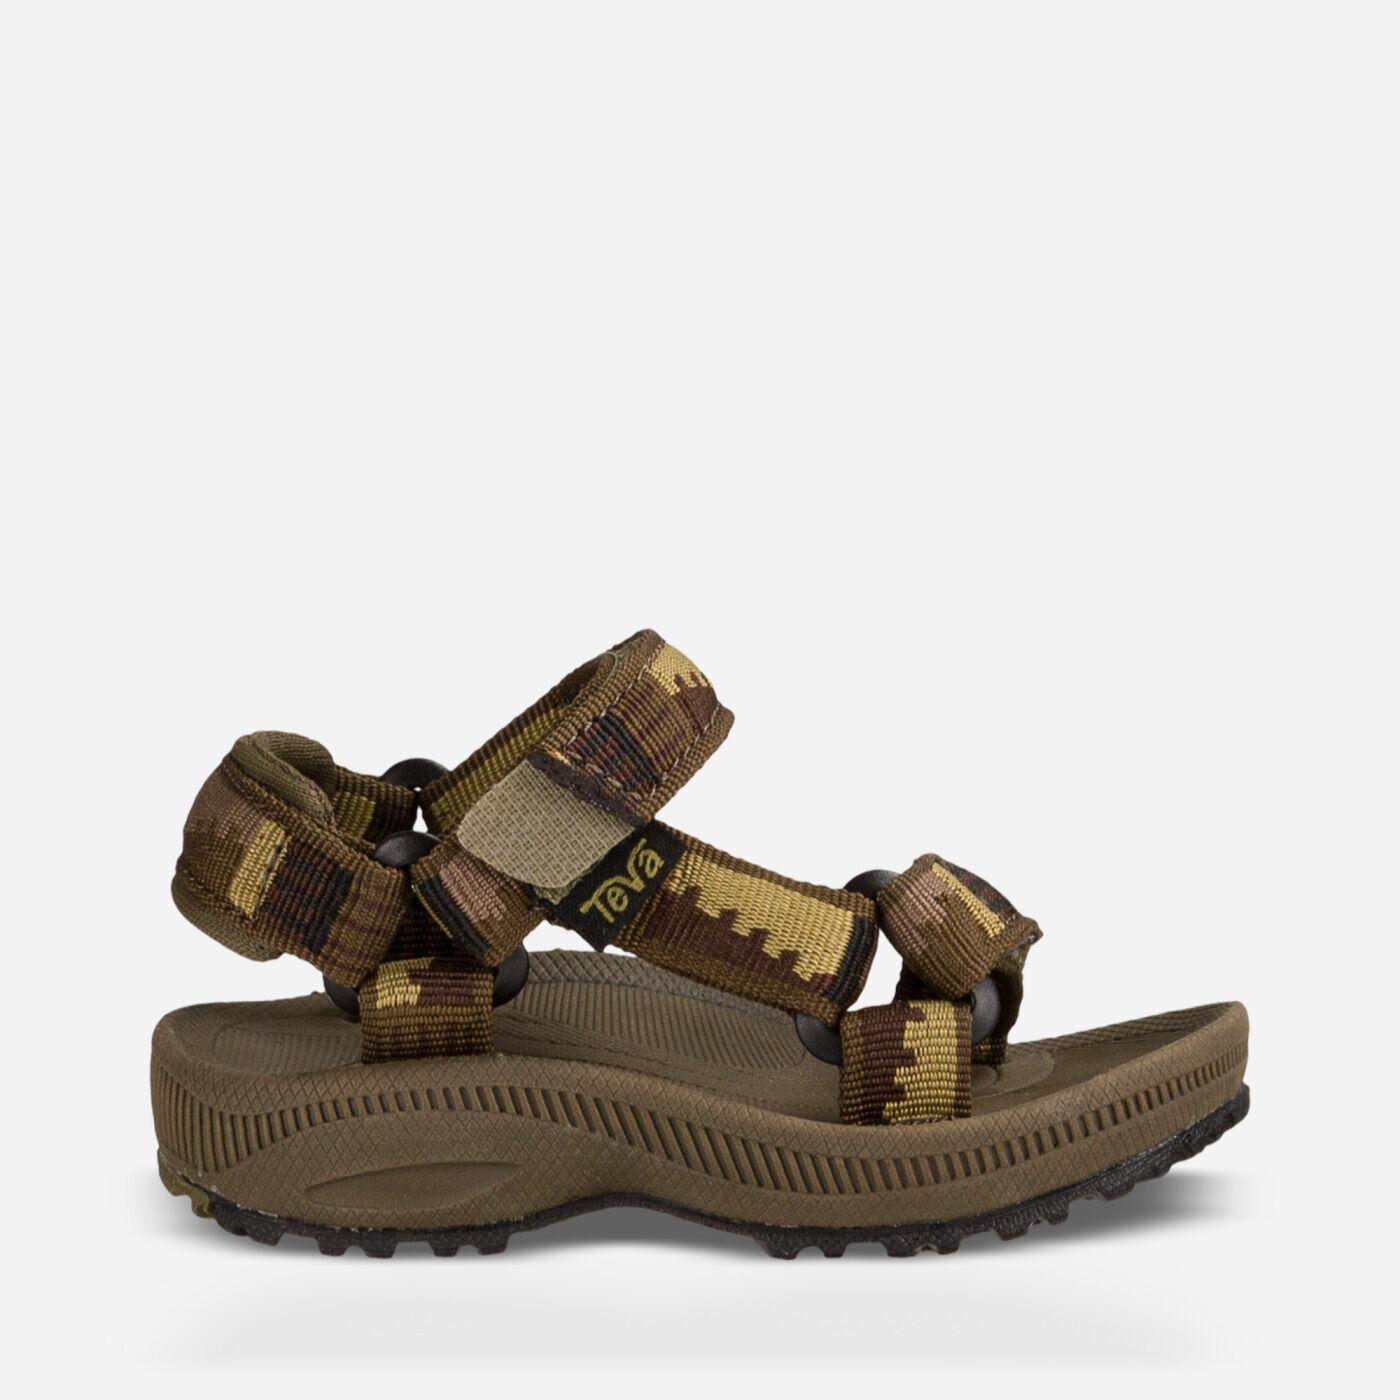 Black sandals for toddler boy - Hurricane 2